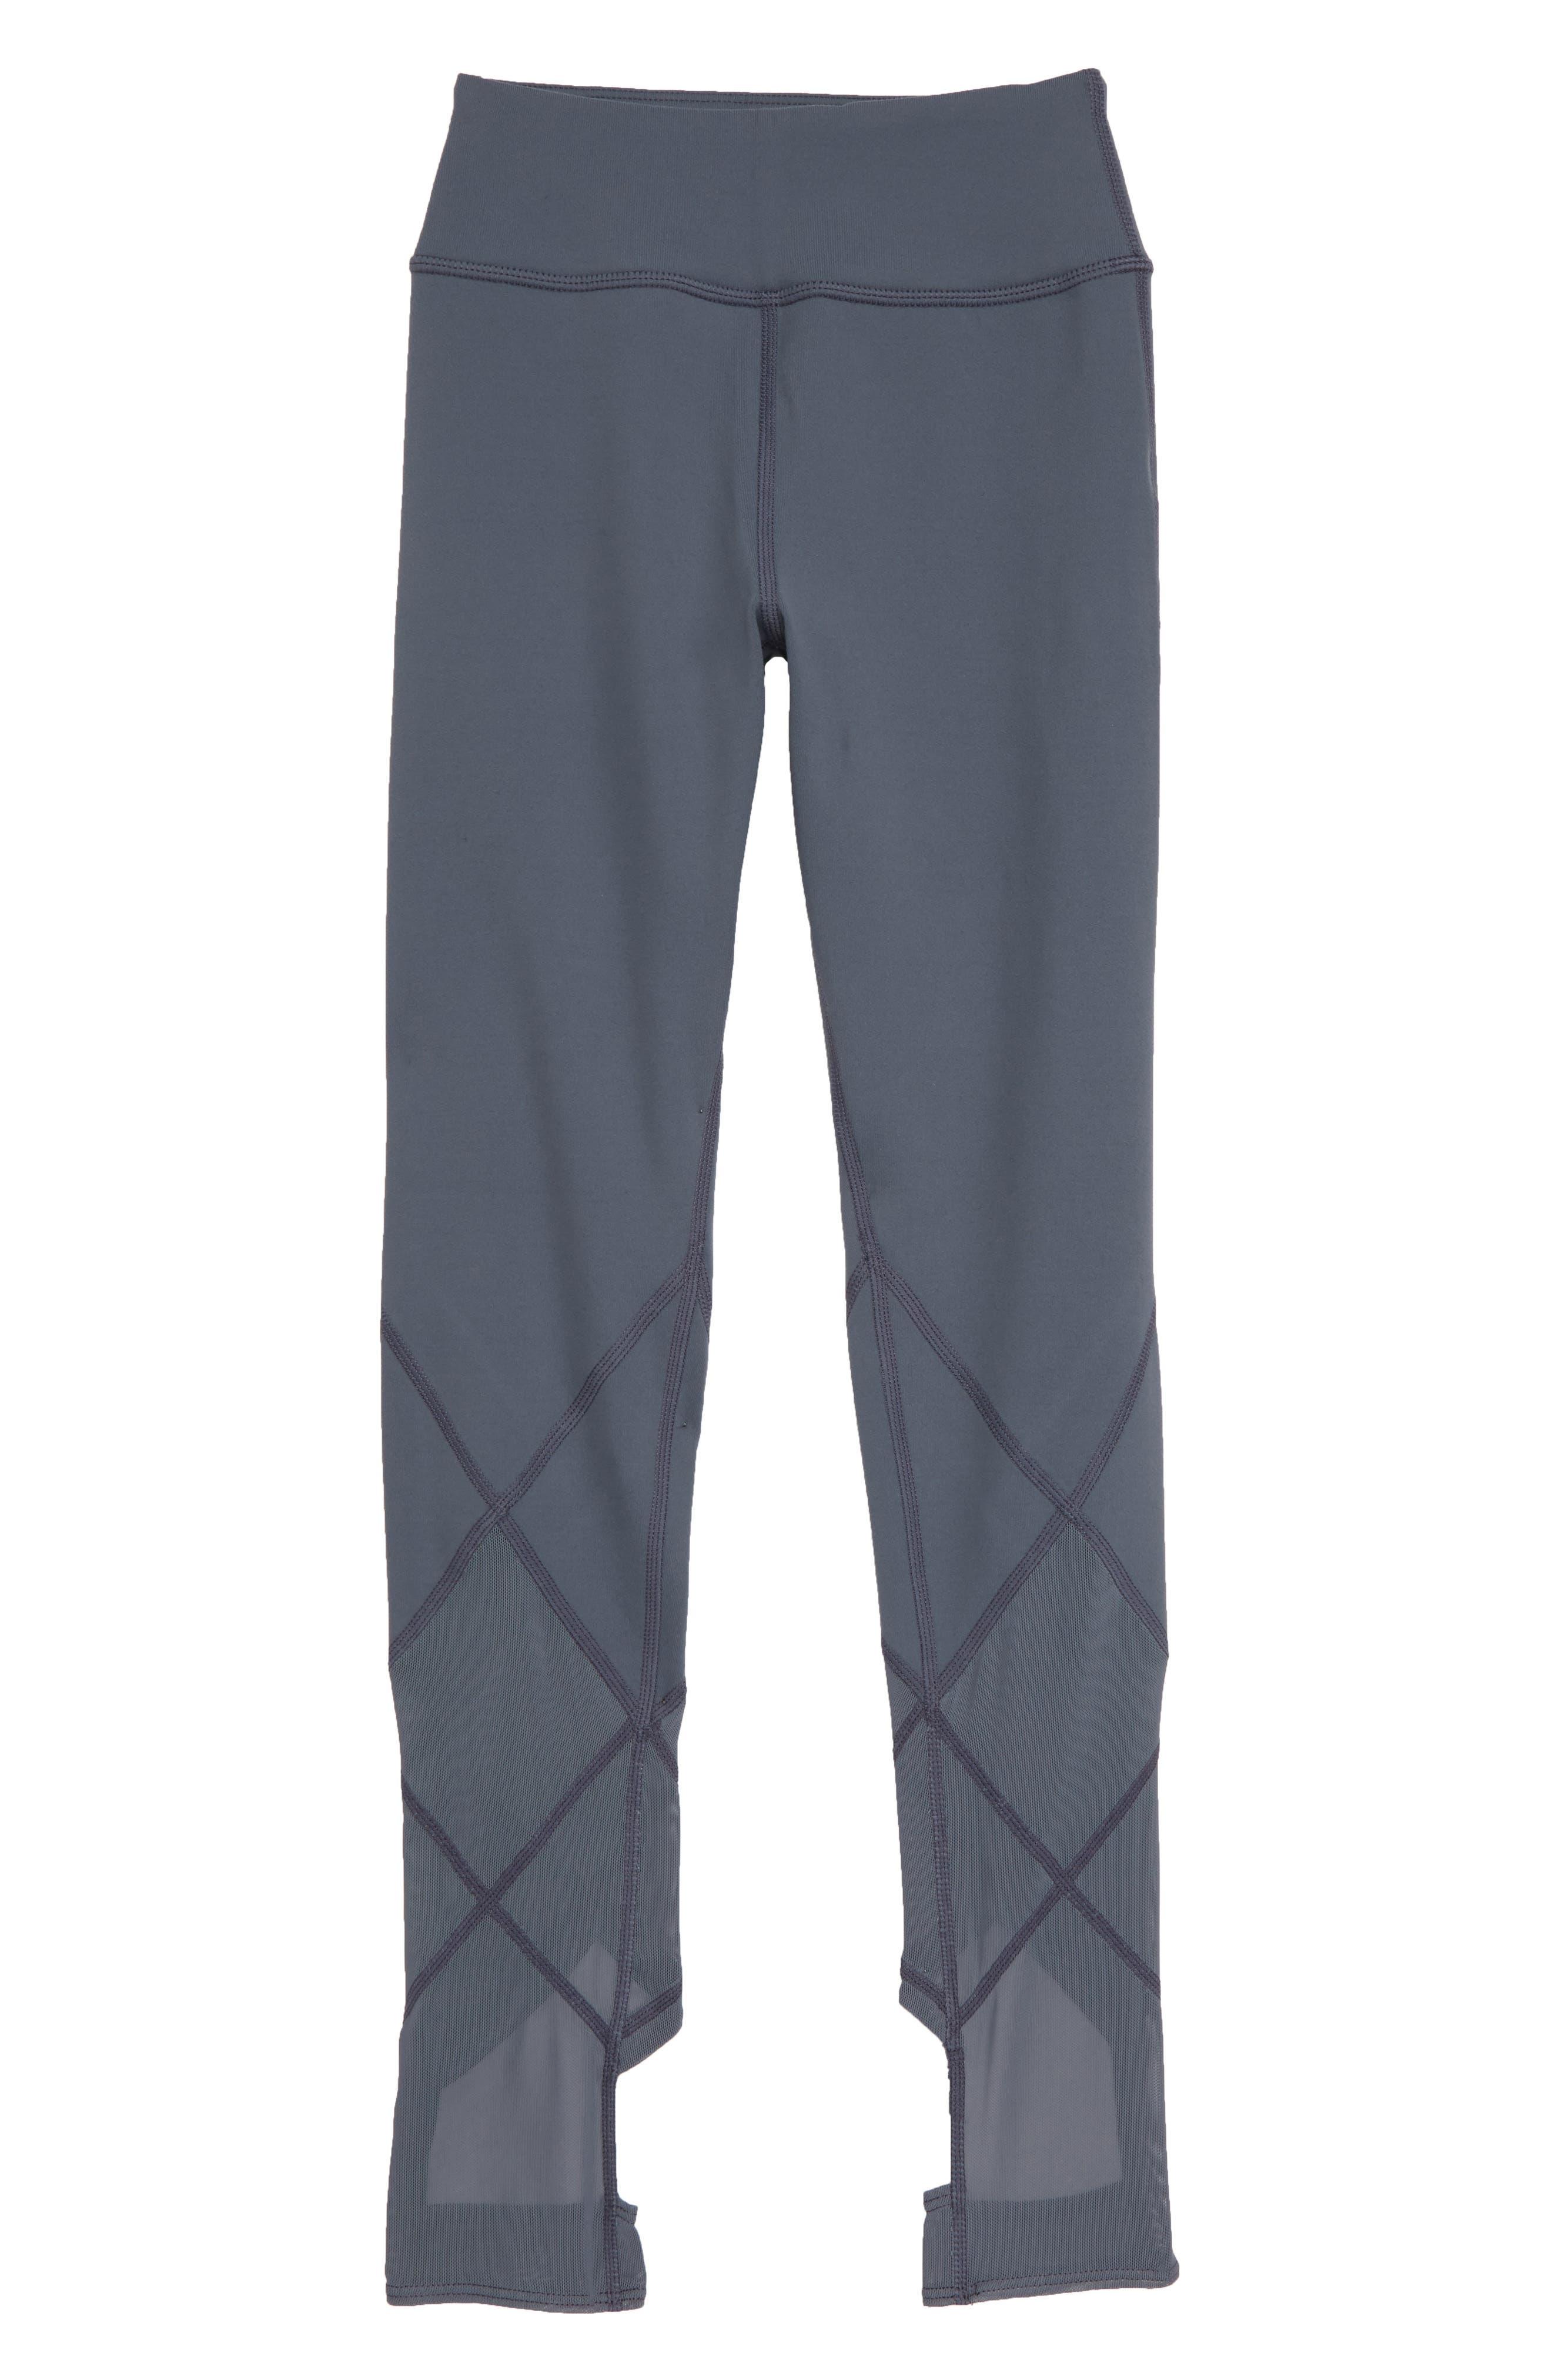 High Waist Diamond Leggings,                         Main,                         color, GREY GRAPHITE